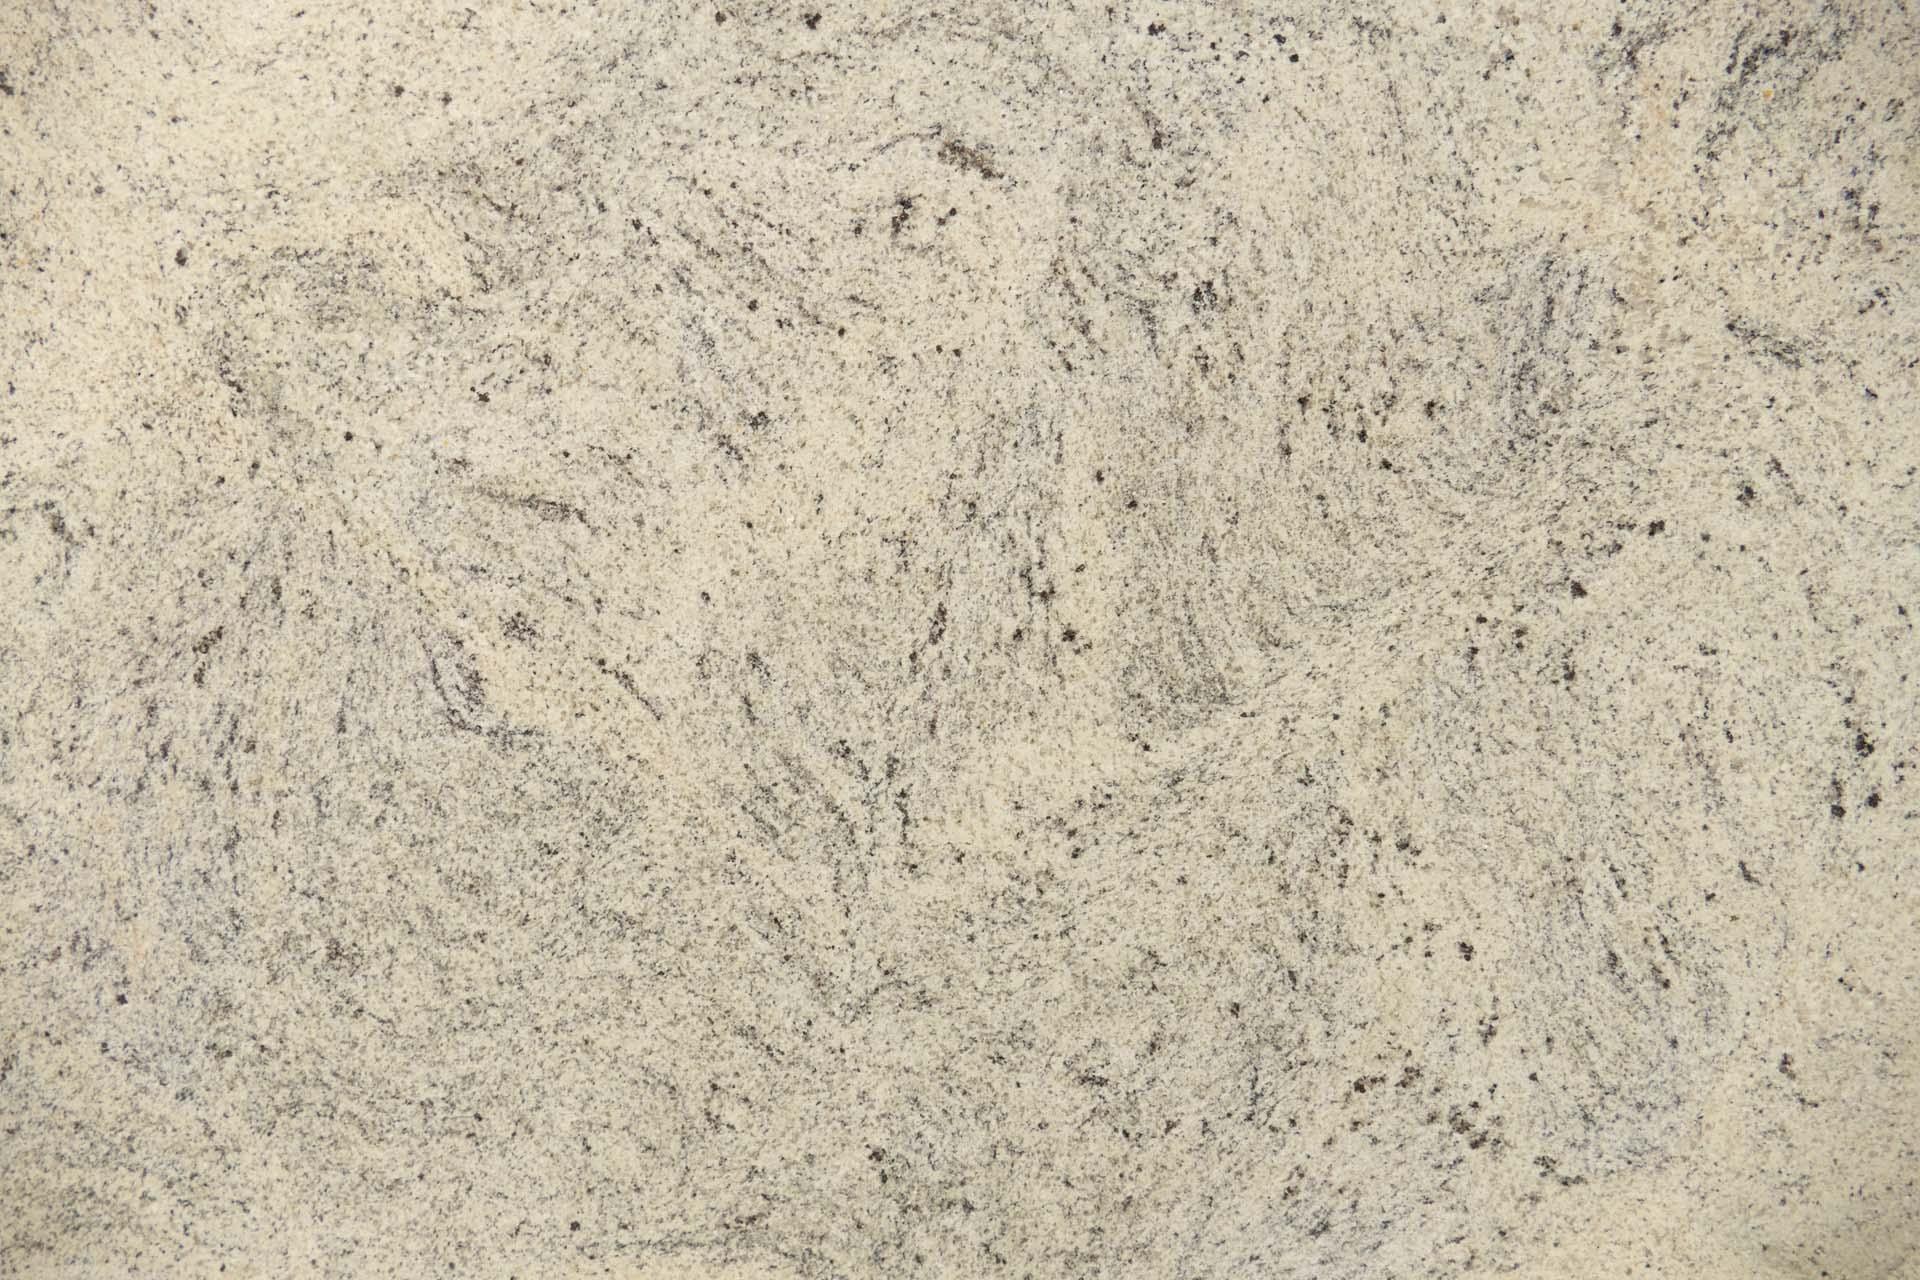 Ivory Fantasy Granite SC200918 38761 125634a